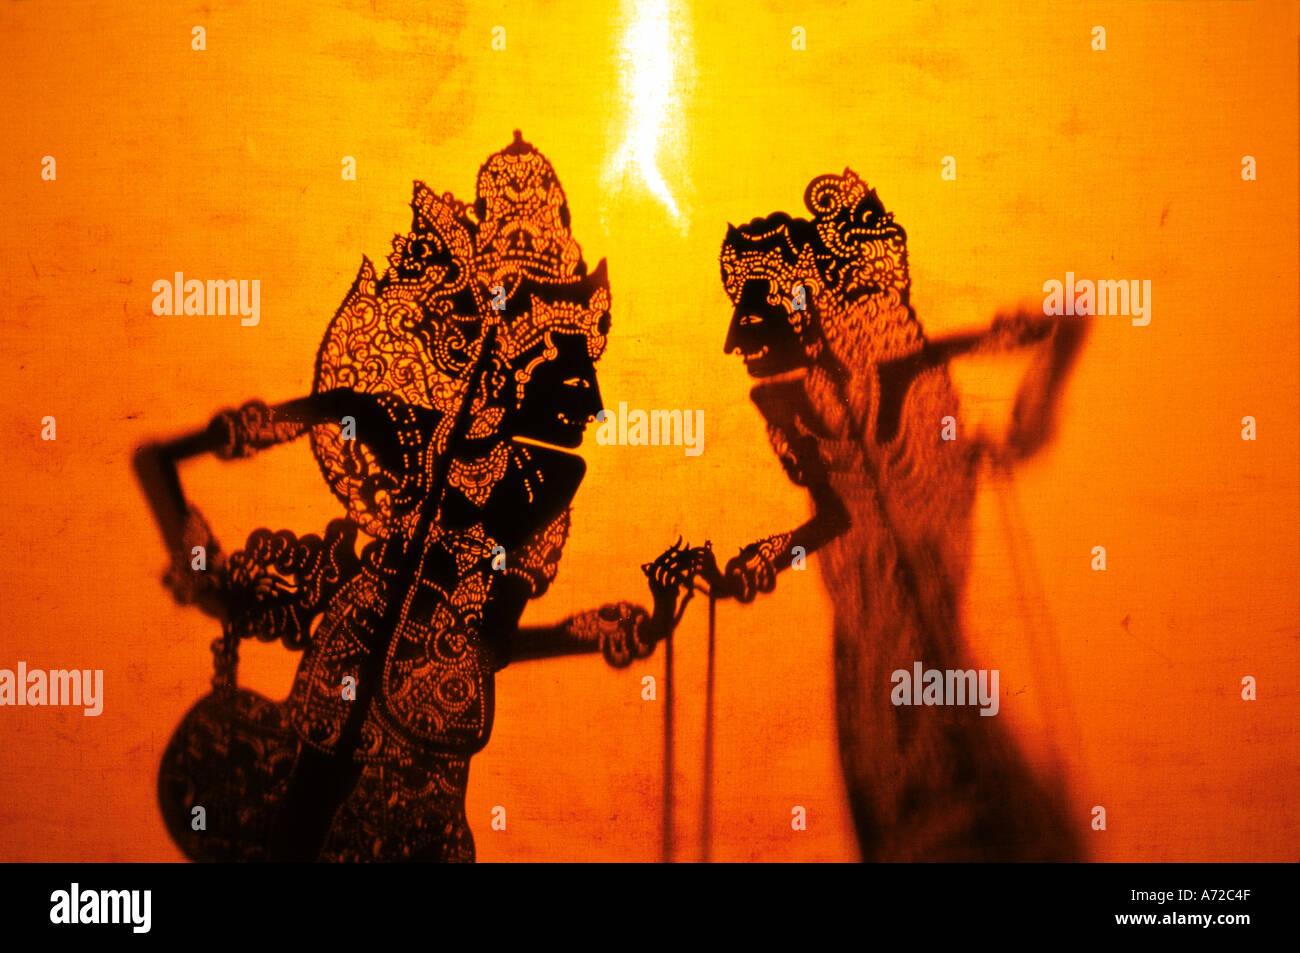 Marionetas de sombras wayang Bali Indonesia Imagen De Stock